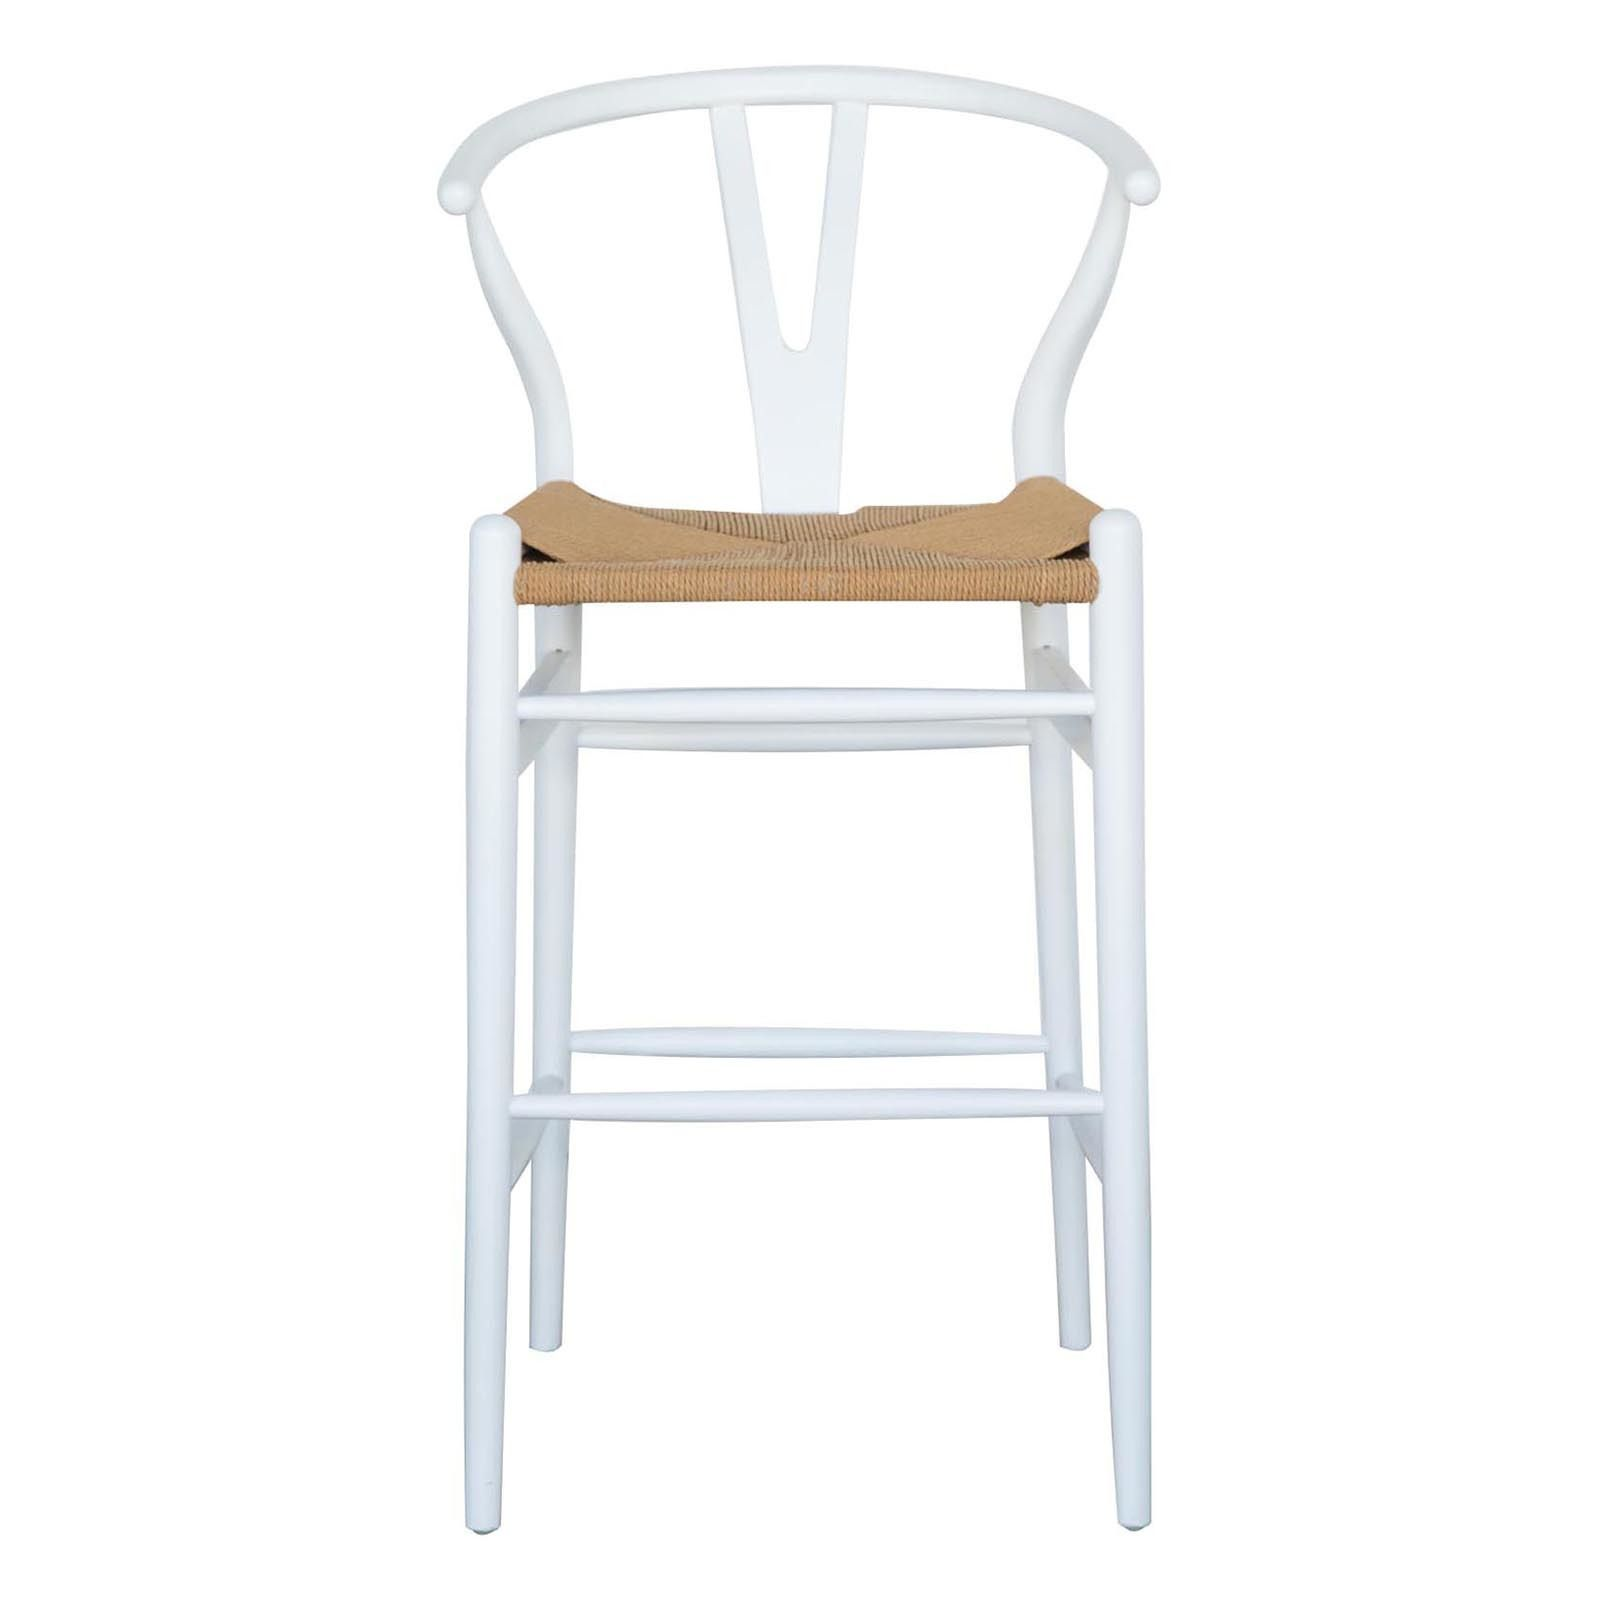 Replica Hans Wegner Wishbone Wood Bar Stool NaturalLP20 Abide Interiors    20W x 20D x 20H cm Seat height 20 cm